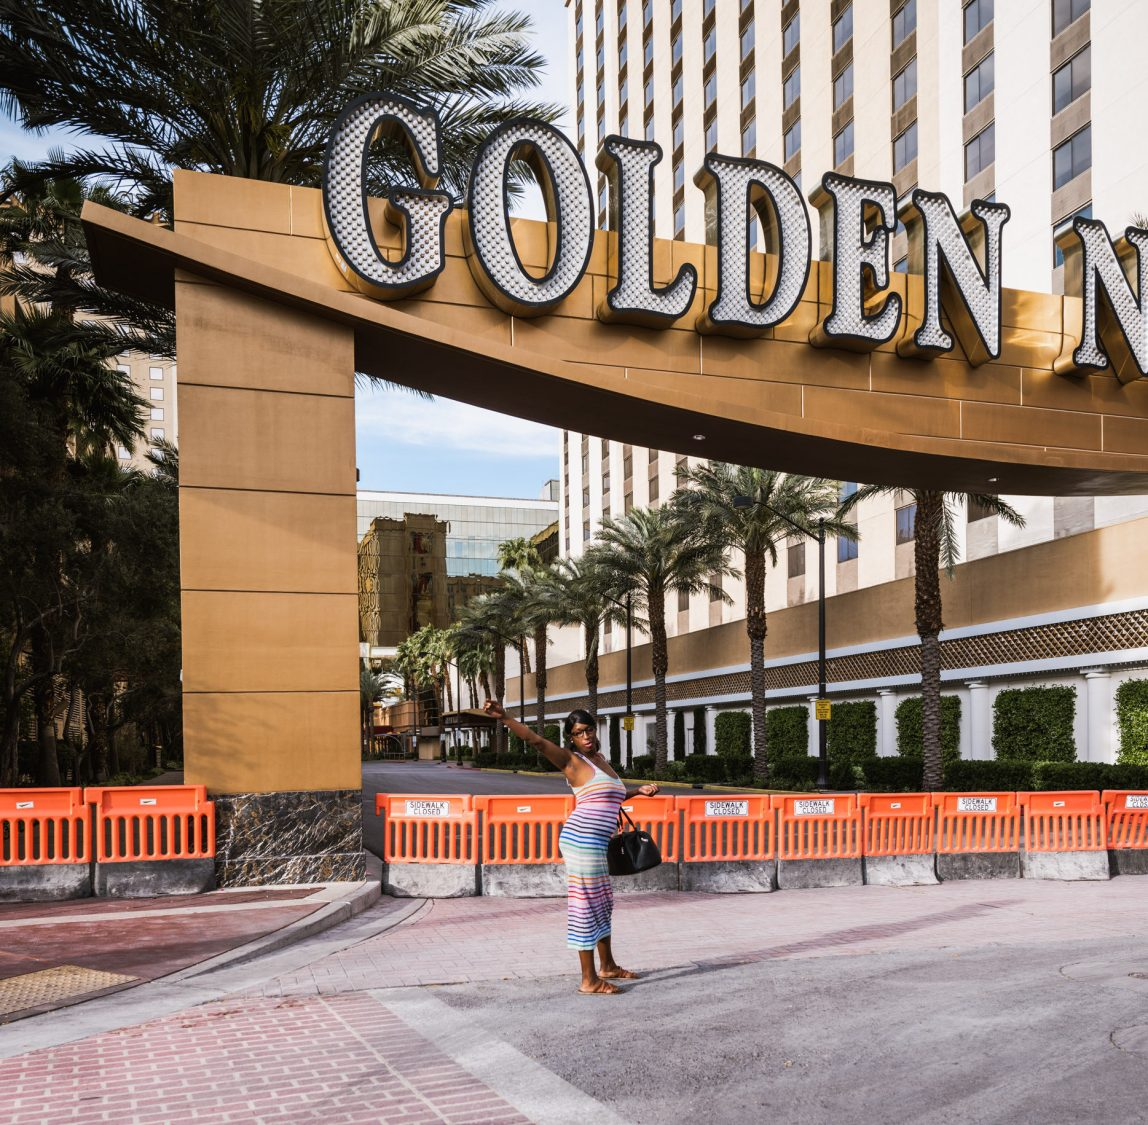 Golden Nugget - Las Vegas - Covid